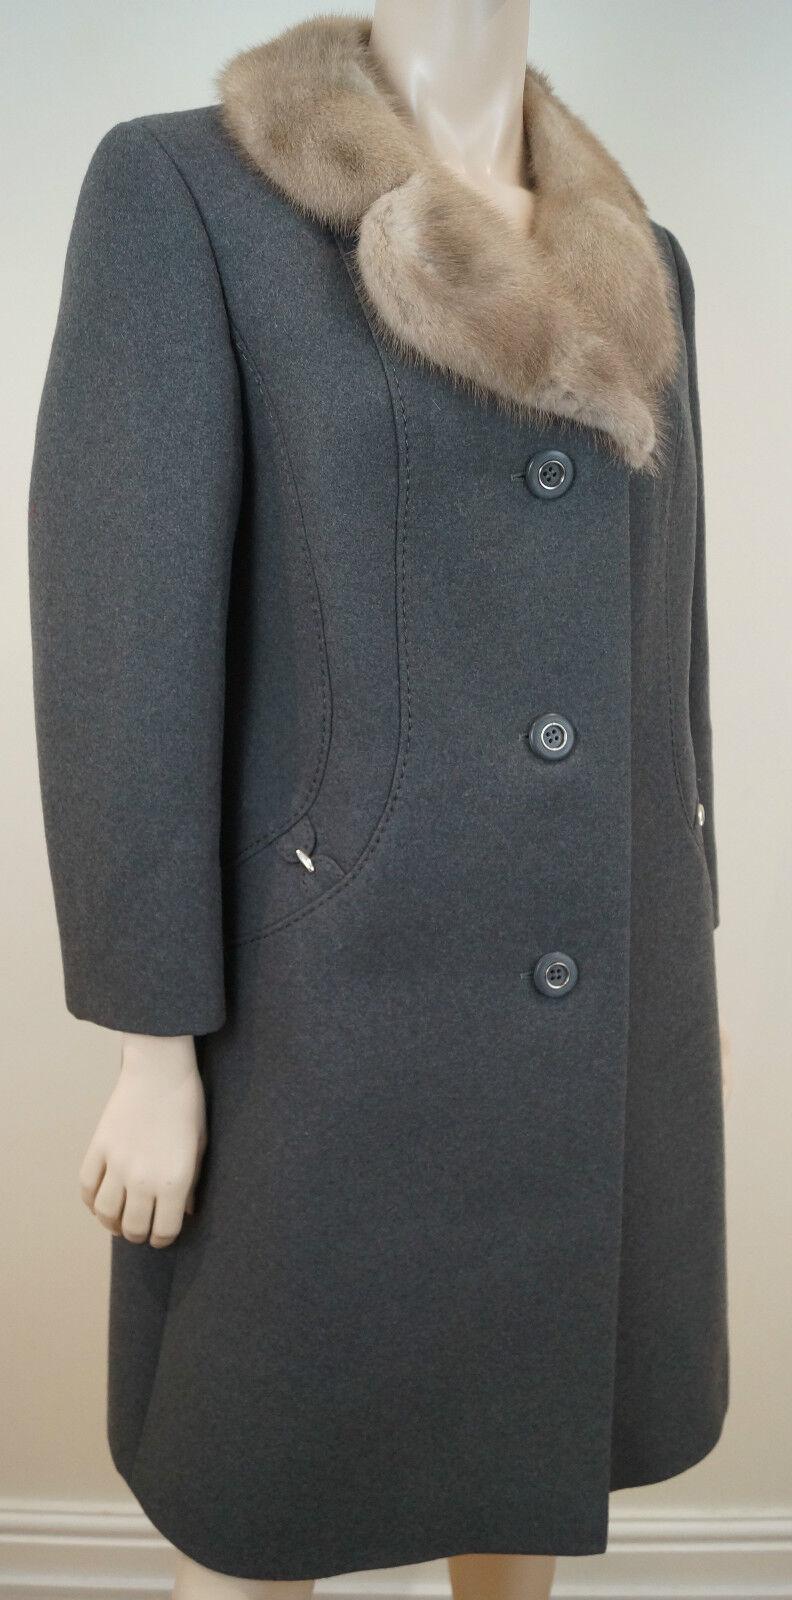 COUTURE  COMTESSE gris Pure Wool Beige Mink Fur Collarojo Lined Winter Coat Sz M  mejor calidad